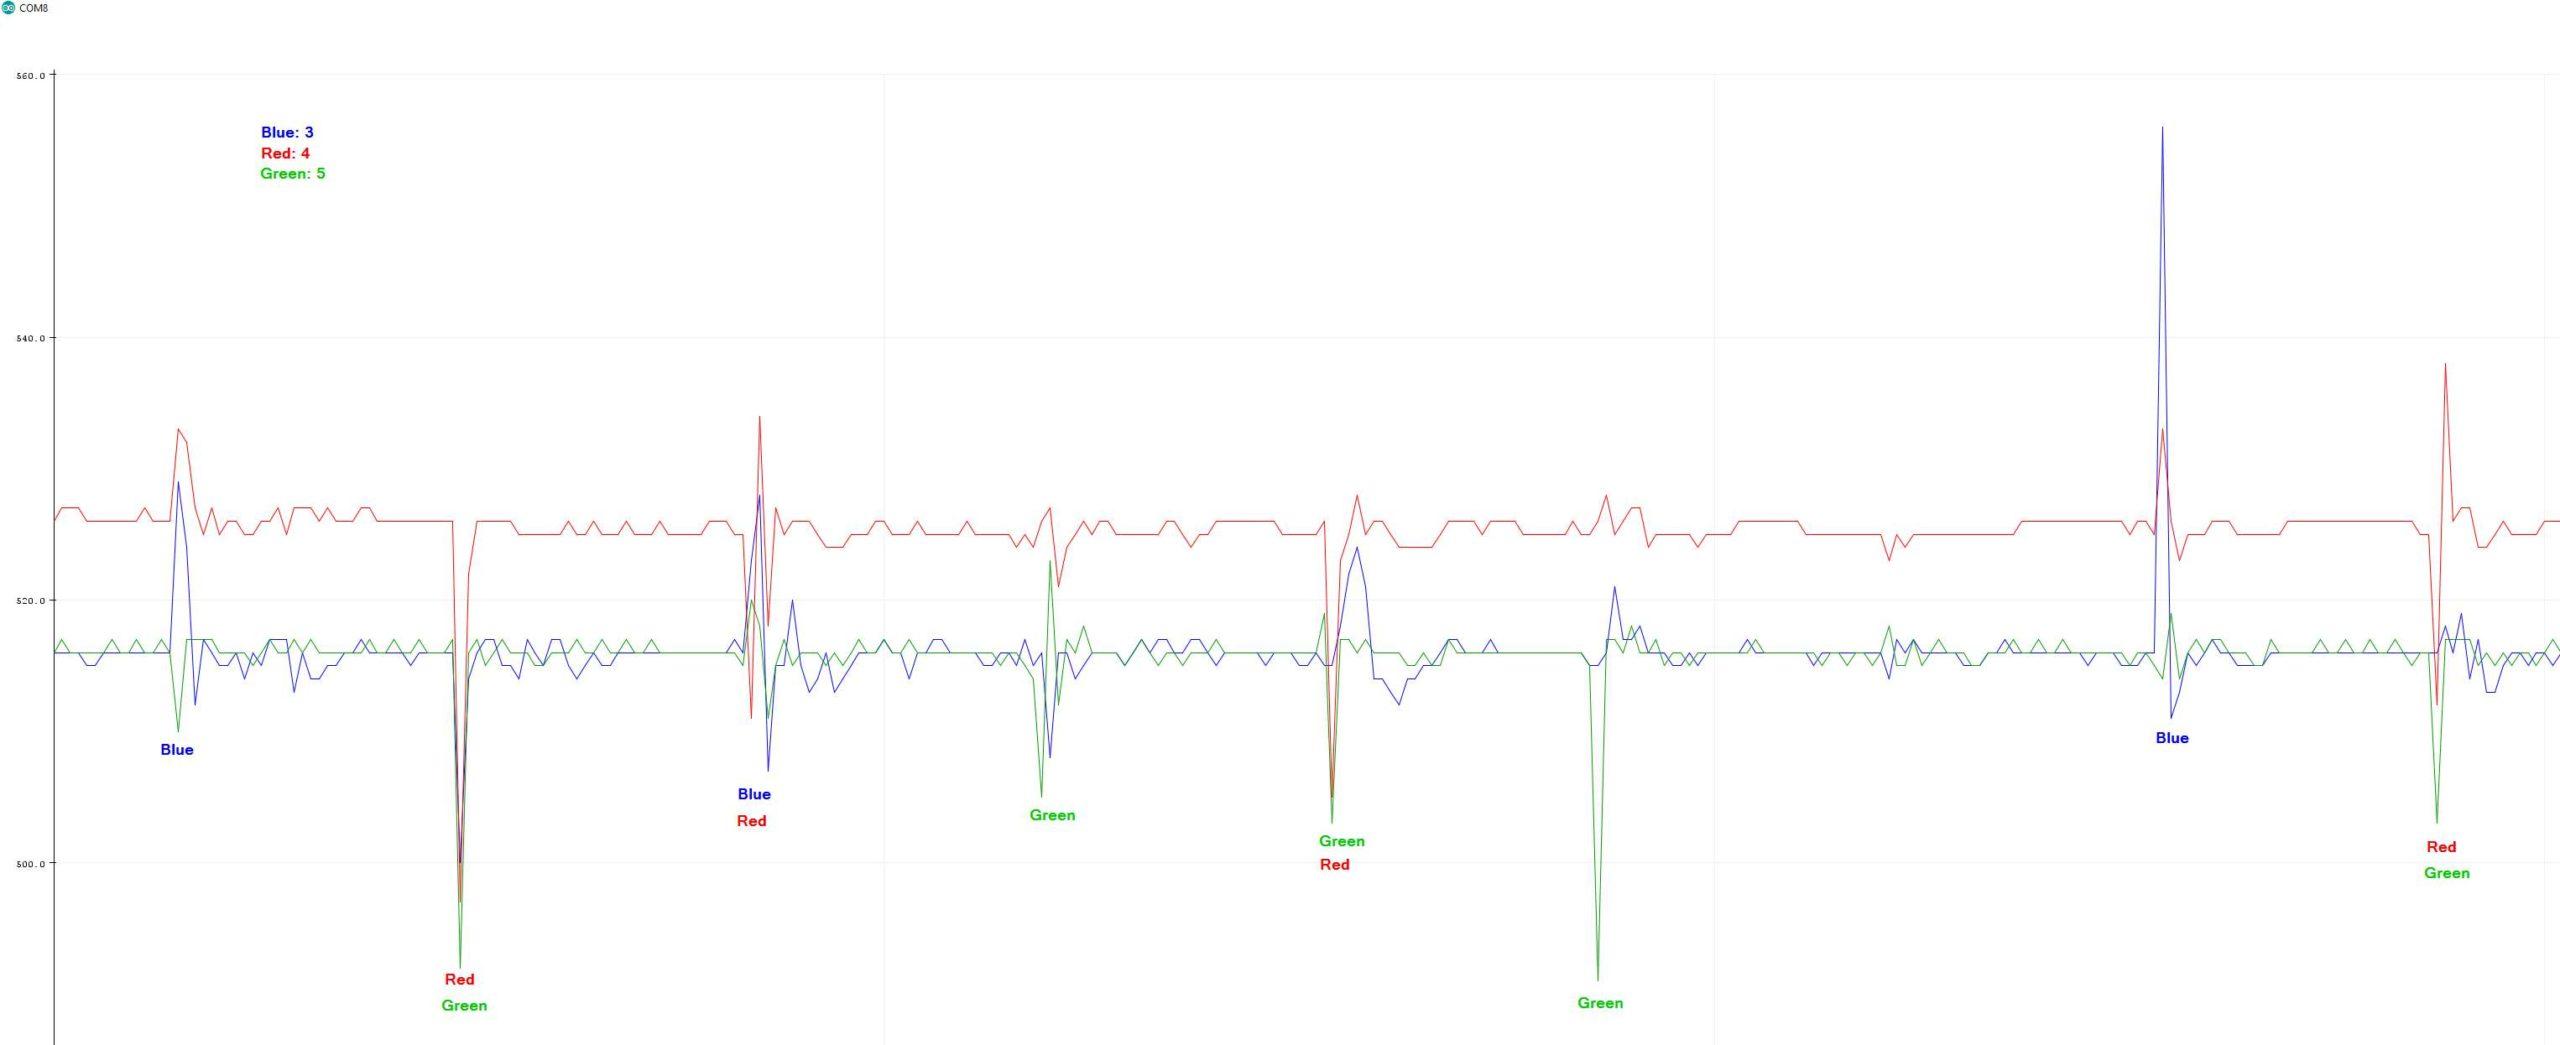 KY-038 and KY-037 Sensitivity Measurement